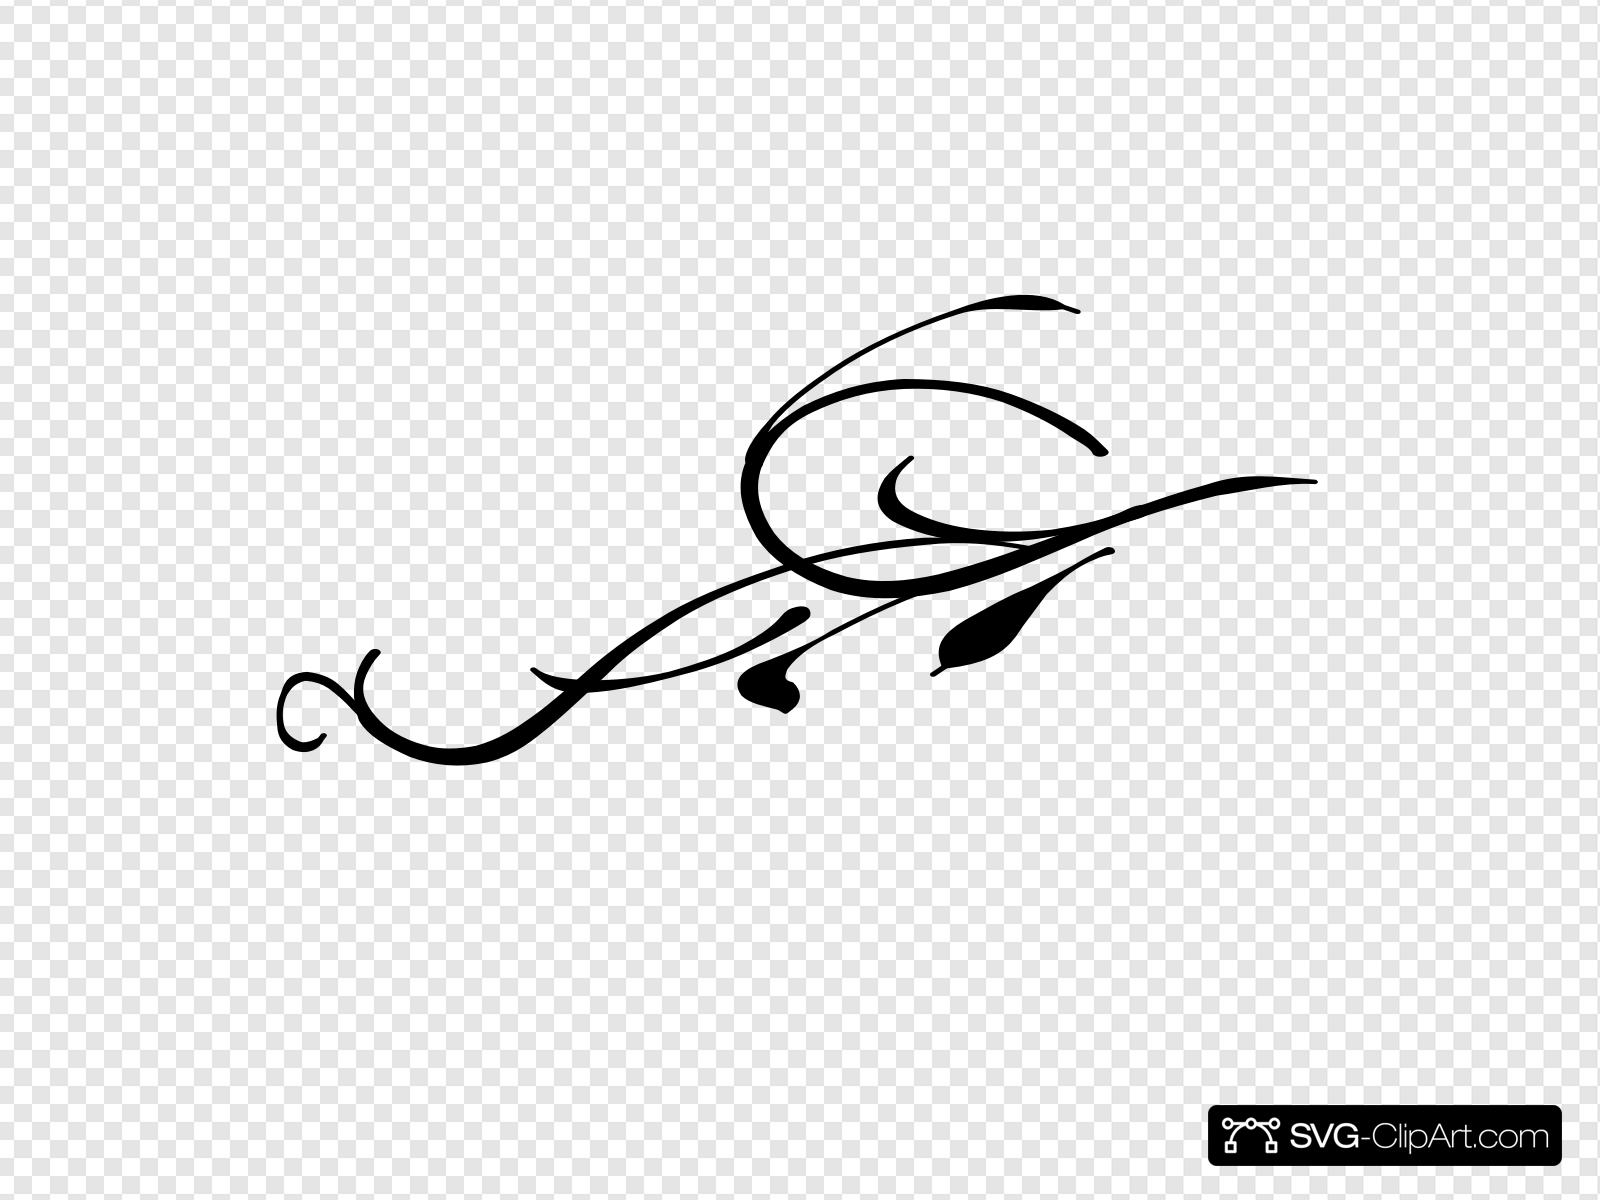 Black Leaf Swirl Clip art, Icon and SVG.